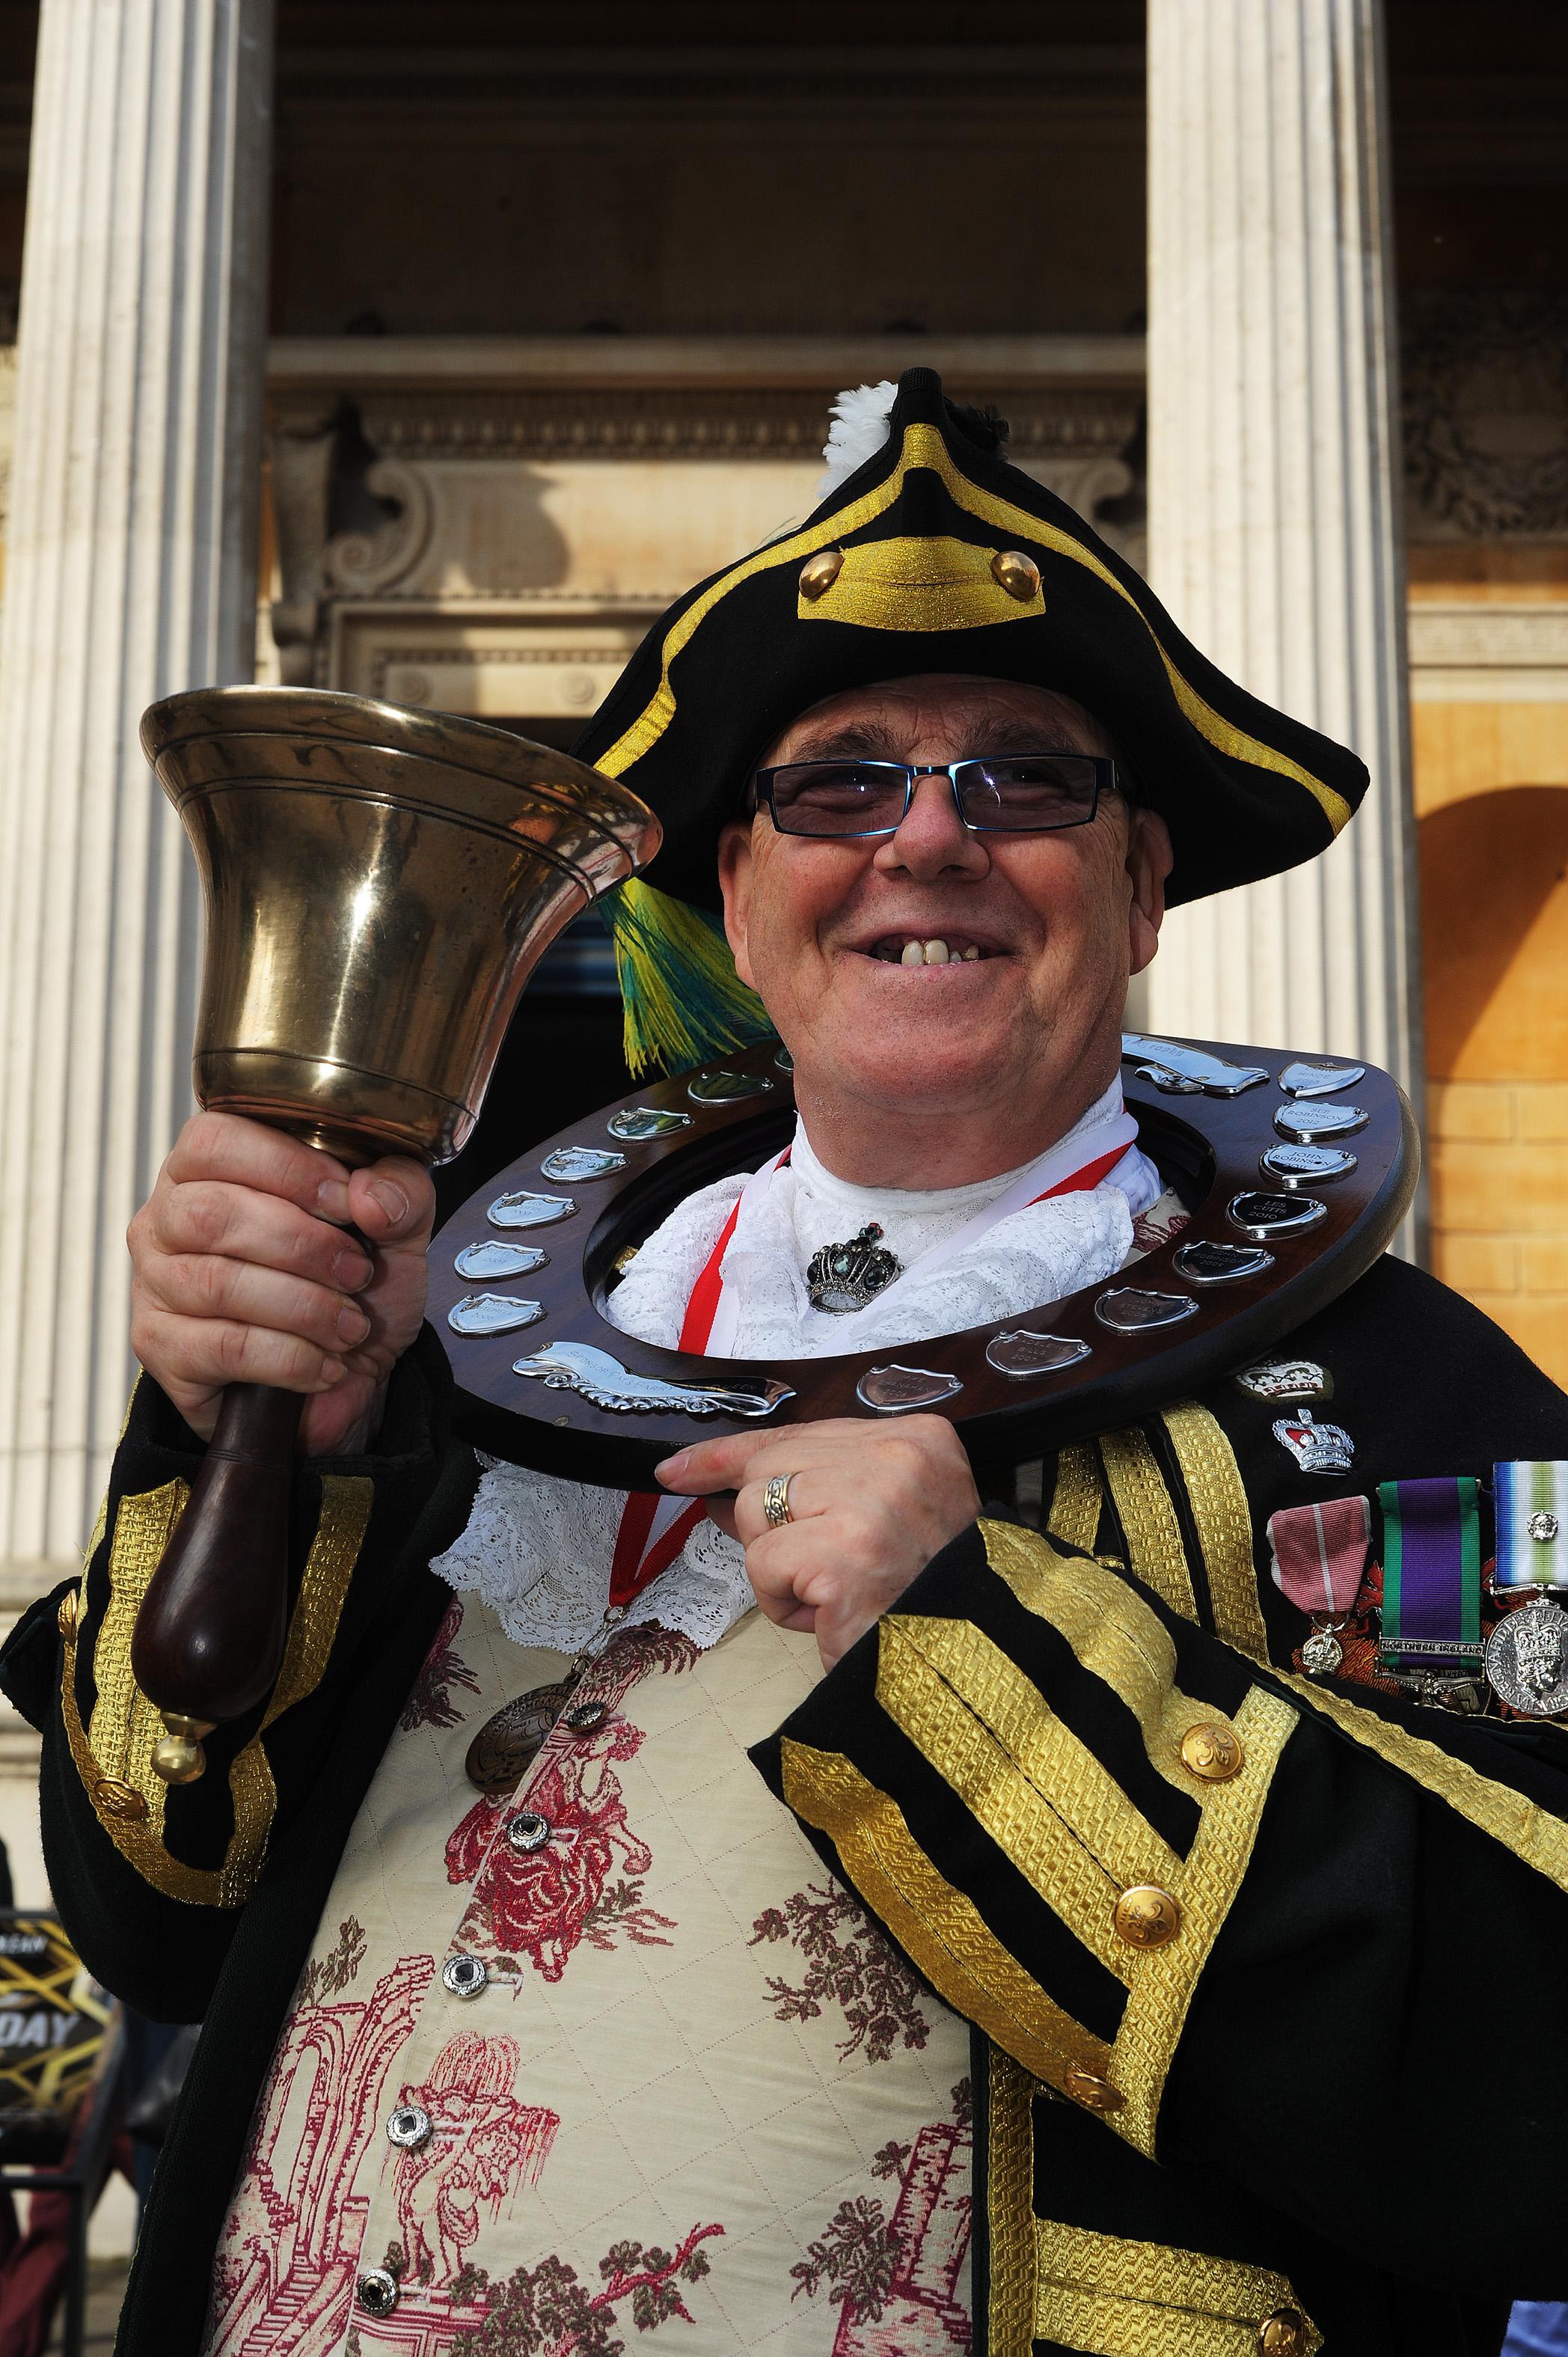 Town Crier quits over wearing war medals that weren't his